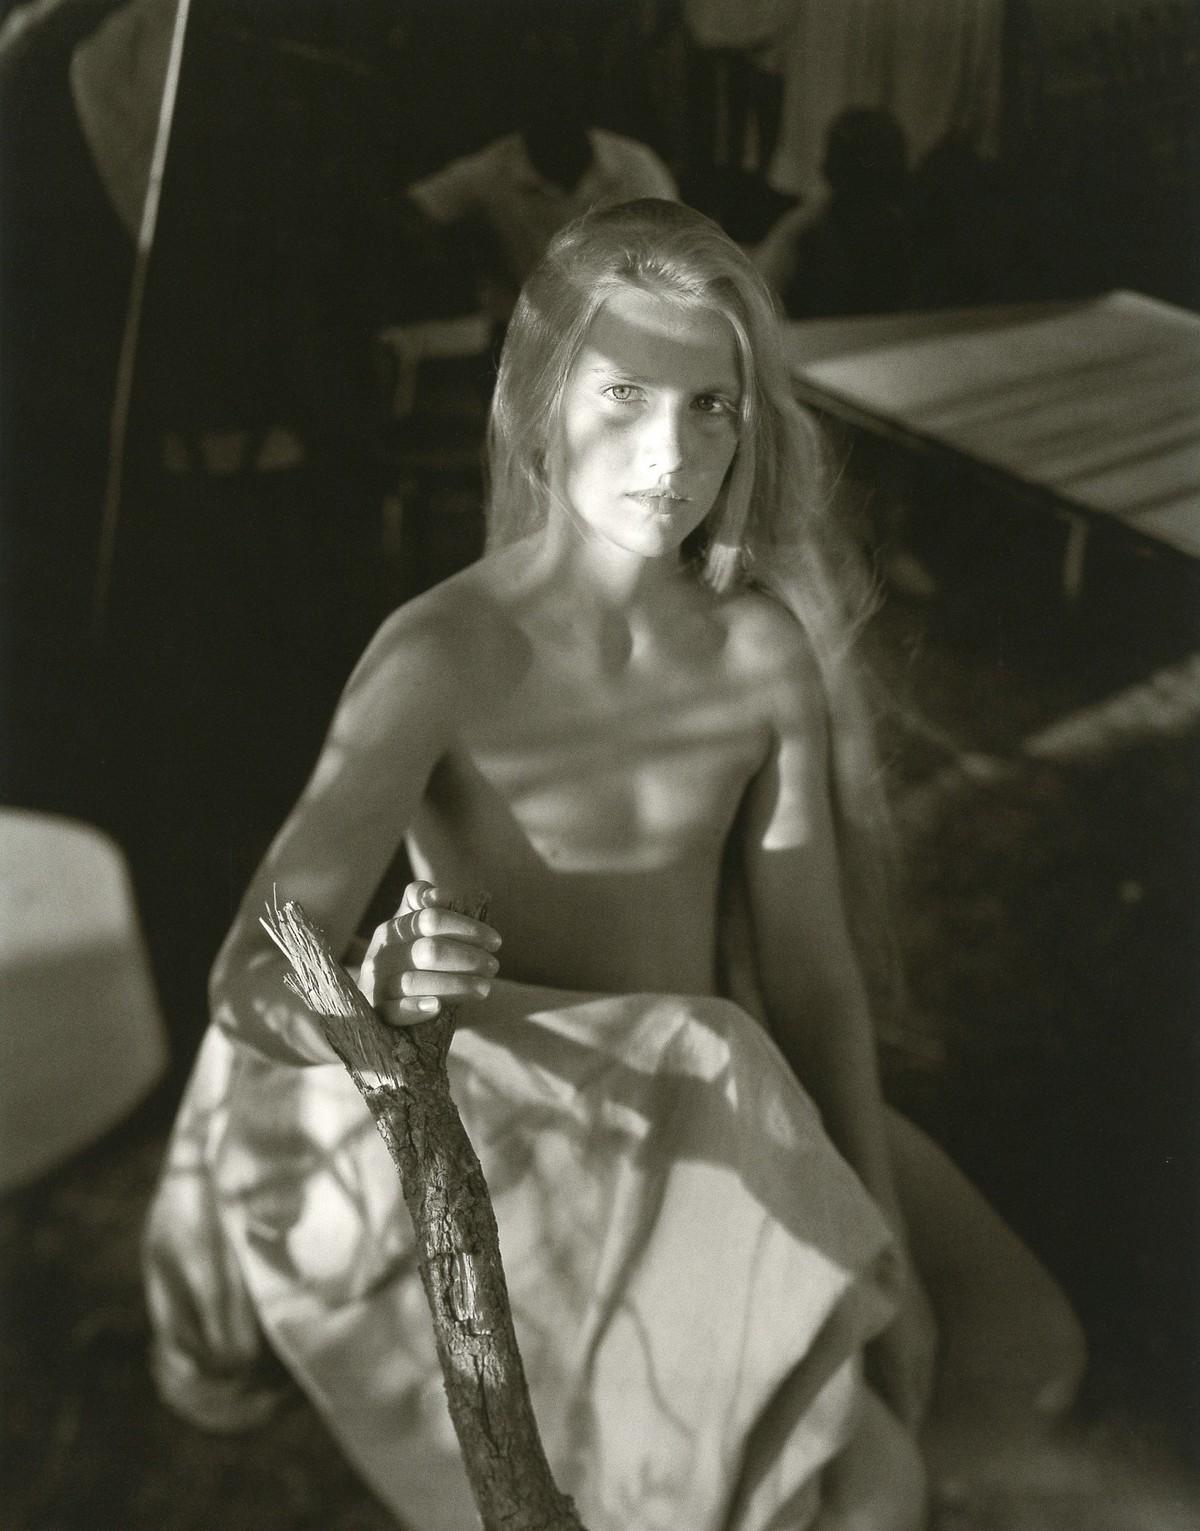 Jock Sturges Nude Photography - Hot Girls Wallpaper